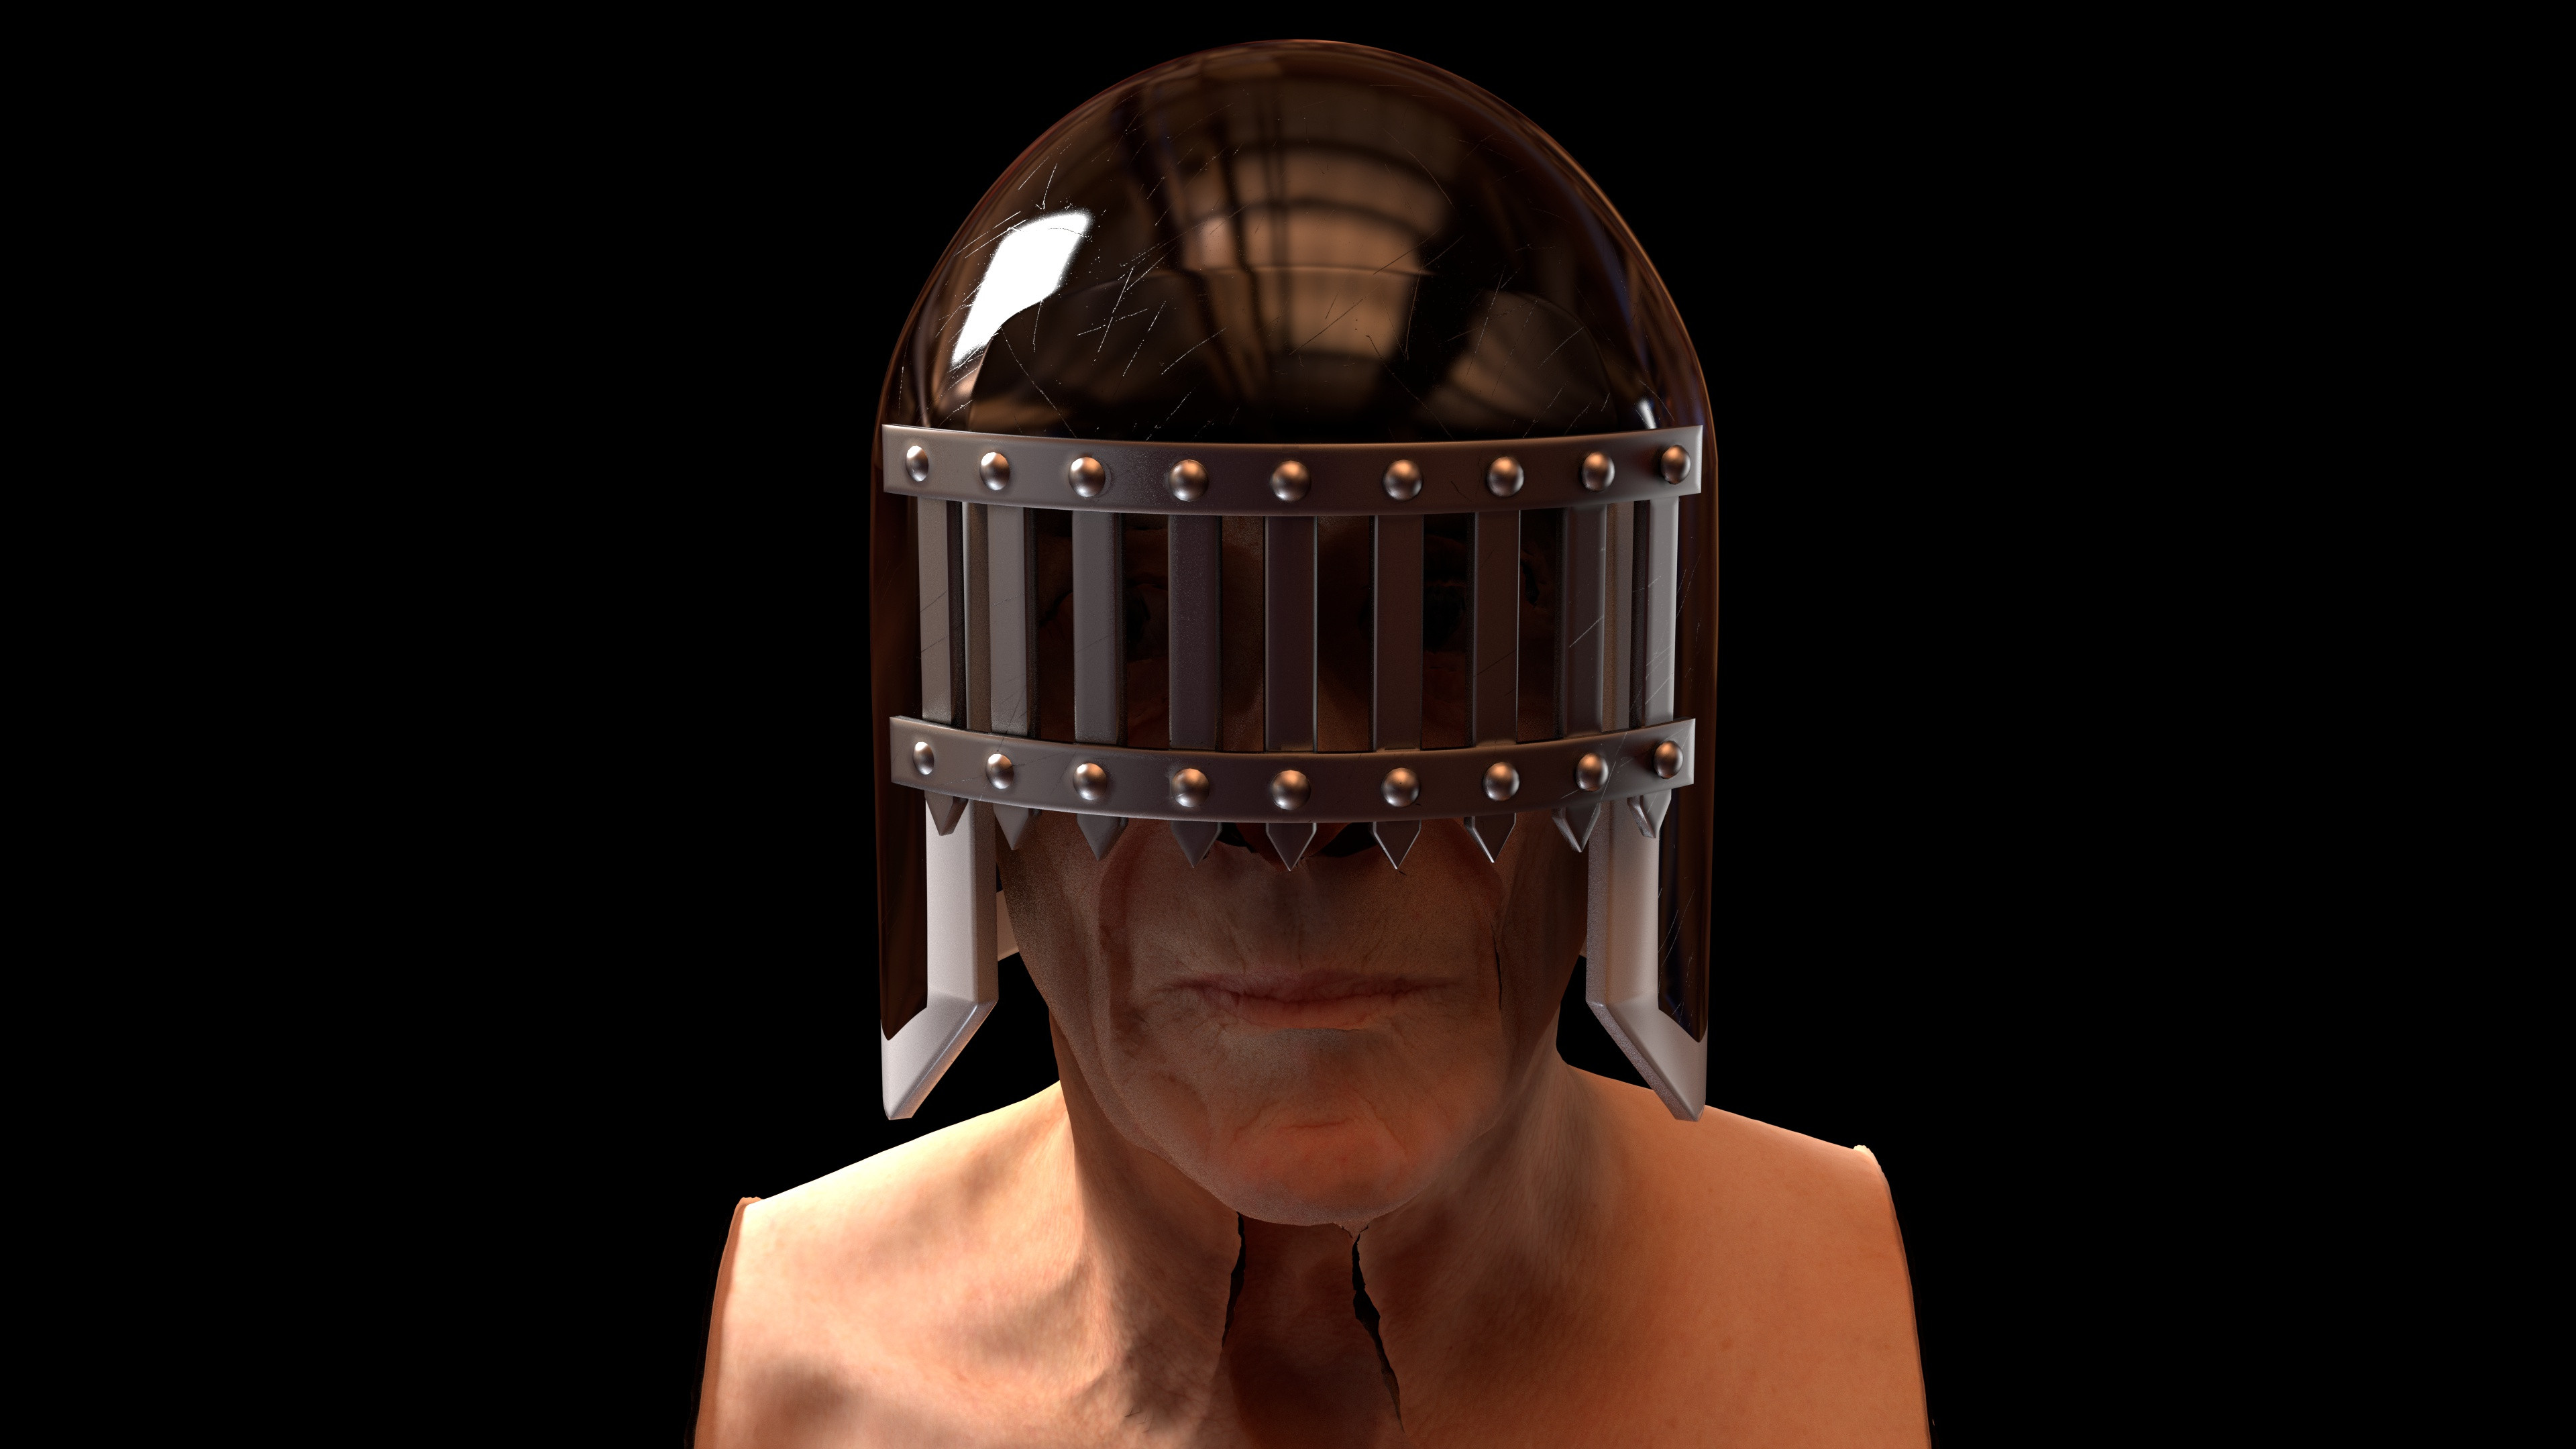 Judge Death Helmet based on a design by Brian Bolland (Head sculpt by Ten24)